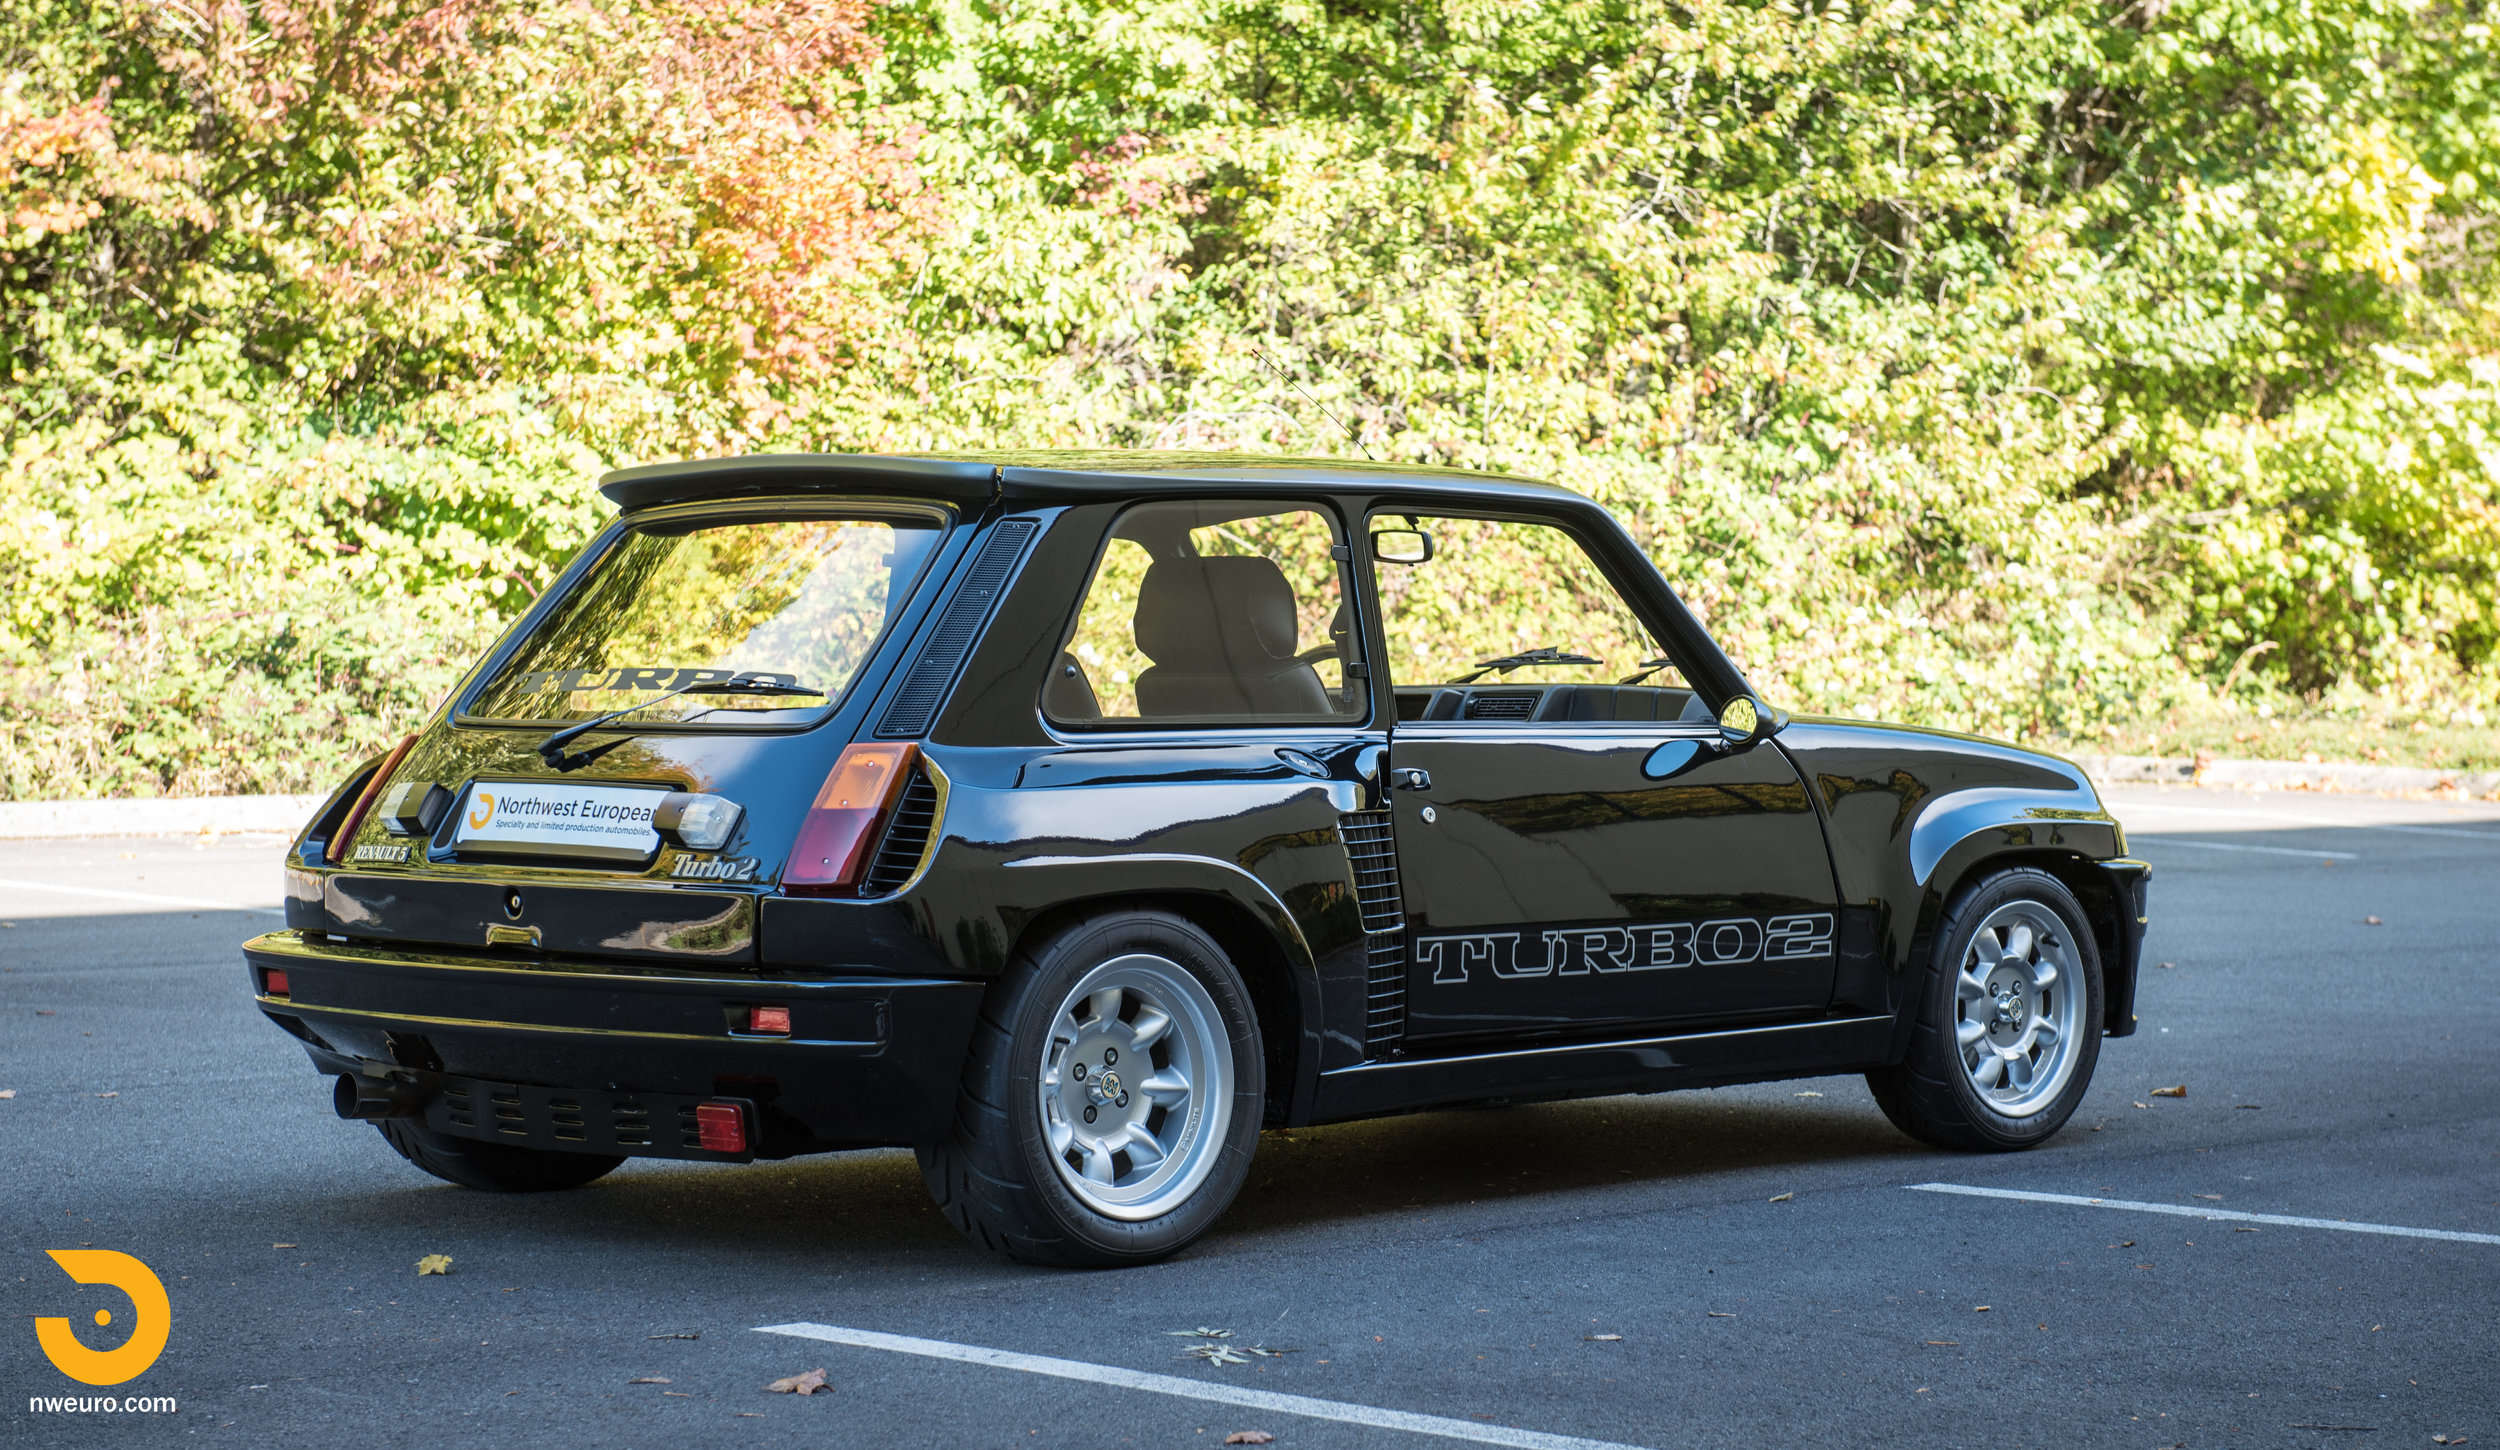 1983 Renault R5 Turbo 2 Black-34.jpg